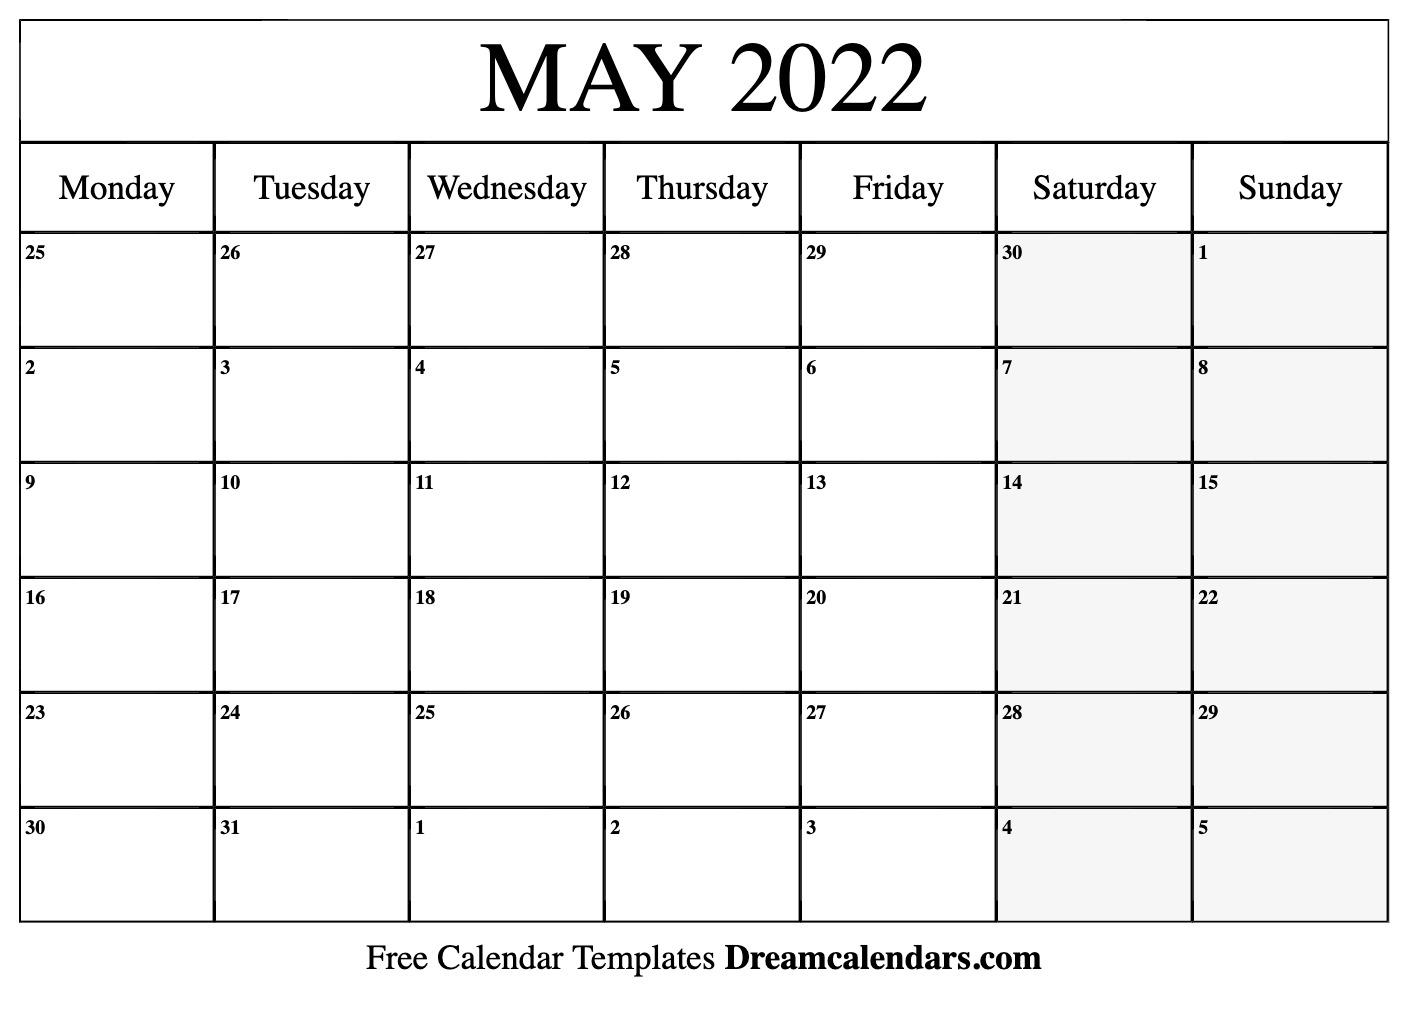 April May 2022 Calendar.May 2022 Calendar Free Blank Printable Templates